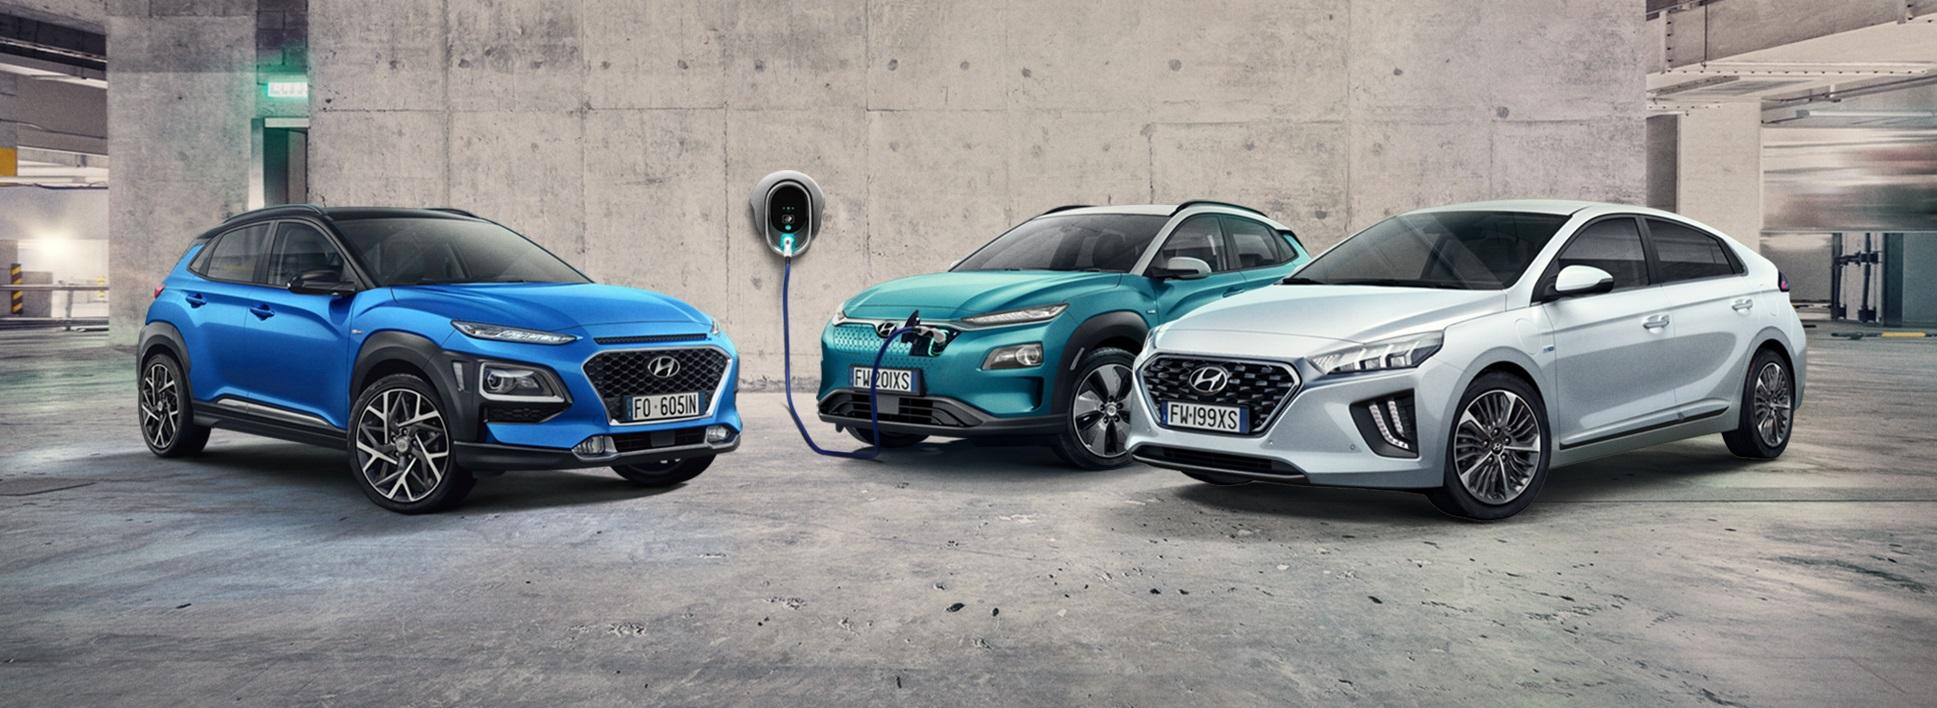 Gamma elettrificata Hyundai